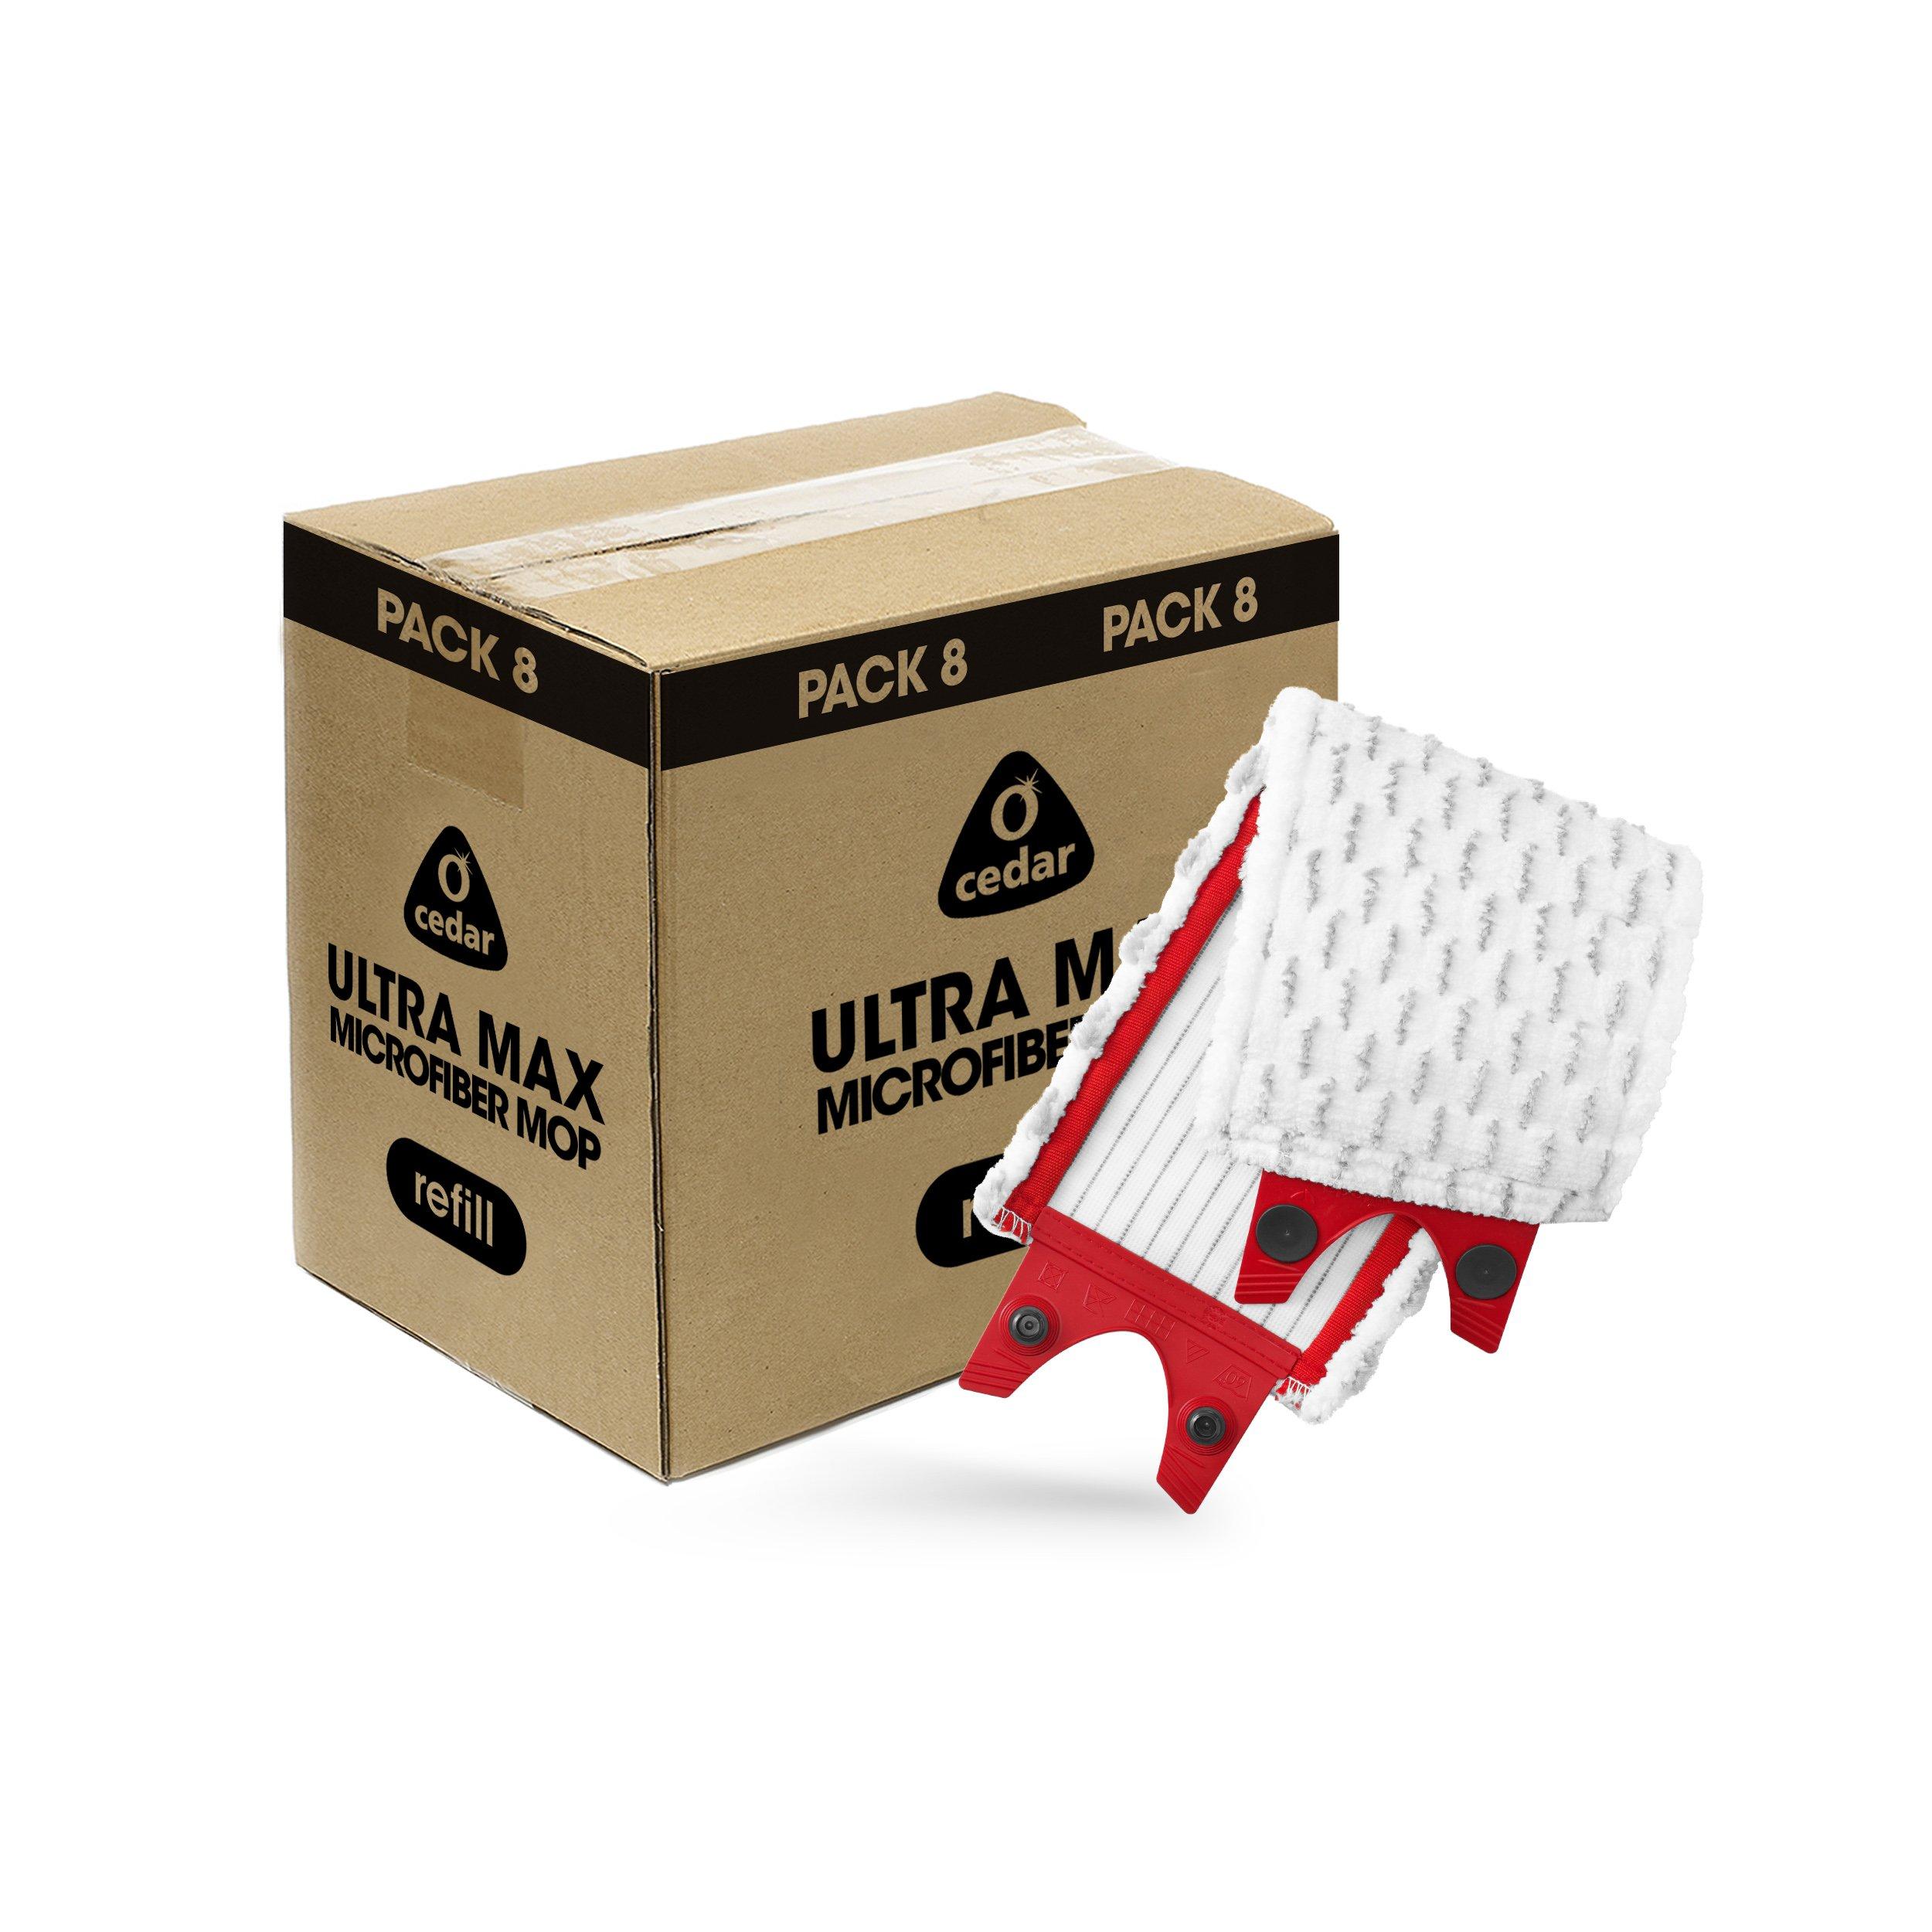 O-Cedar Ultra Max Mop Refill (Pack 8)